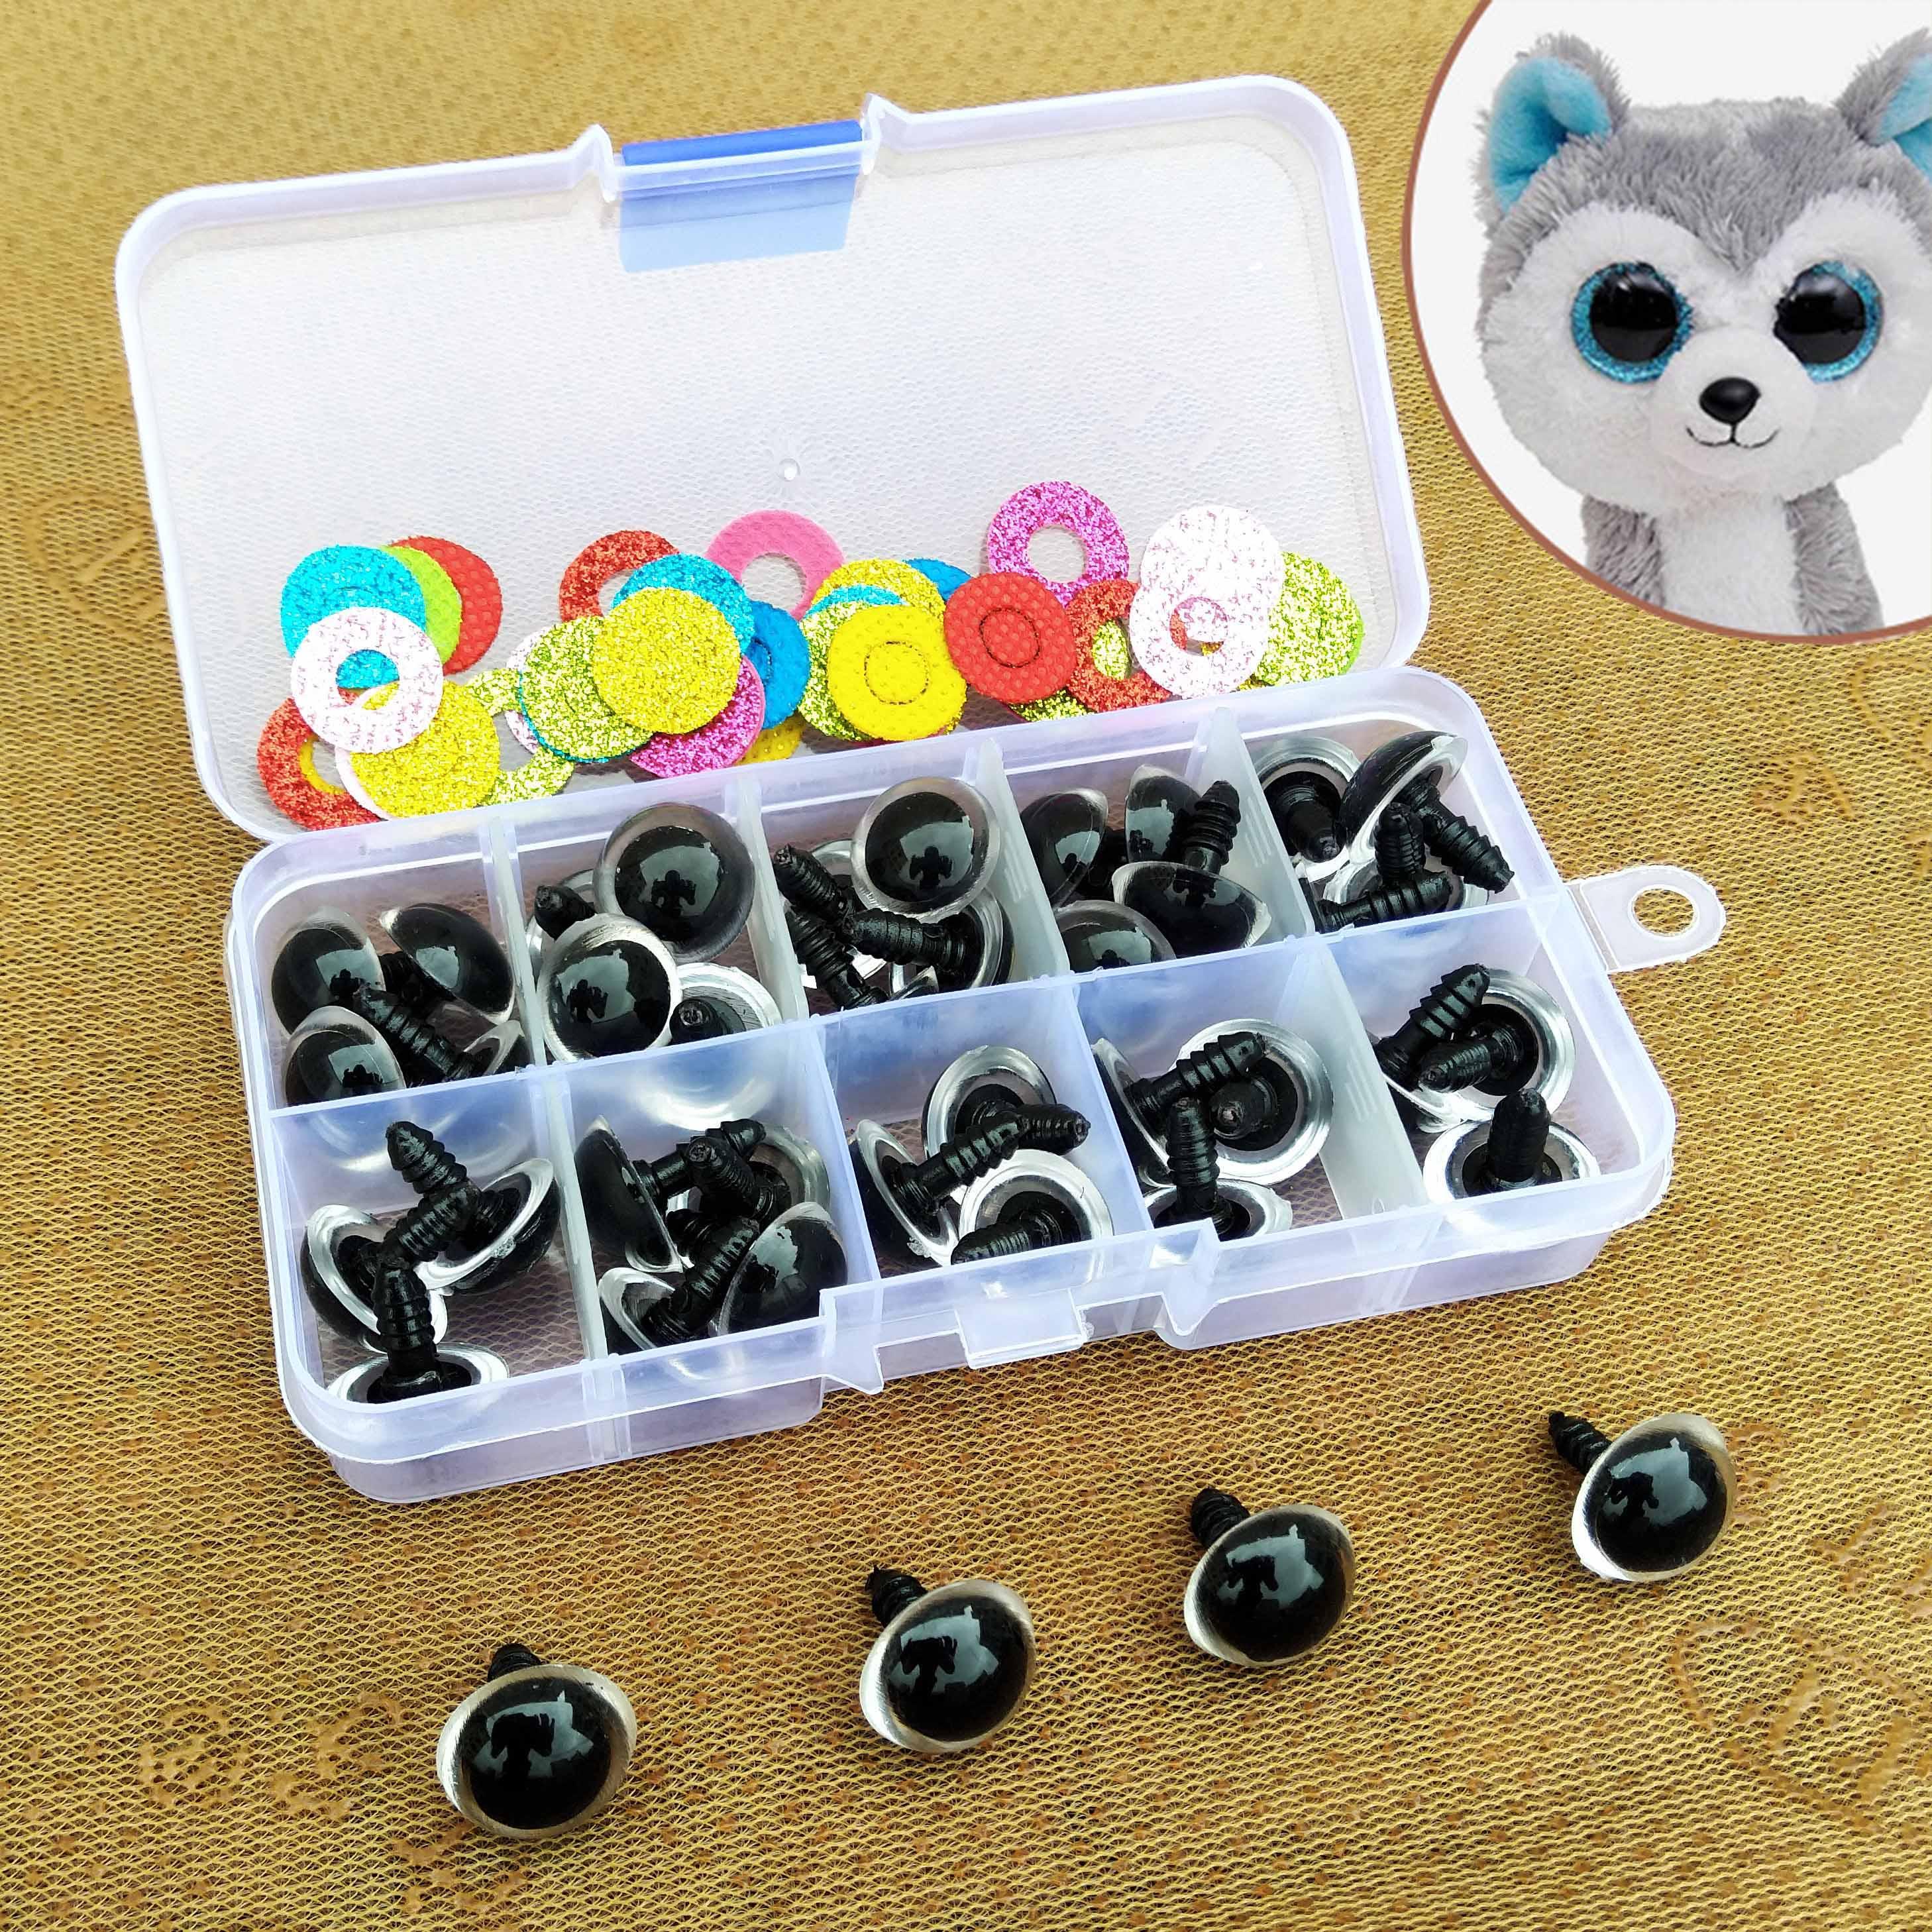 16mm Safety Plastic Colorful Doll Eyes For Toy Crochet Stuffed Animals Dolls Crafty Amigurumi Eyes For Toy Plush Accessories